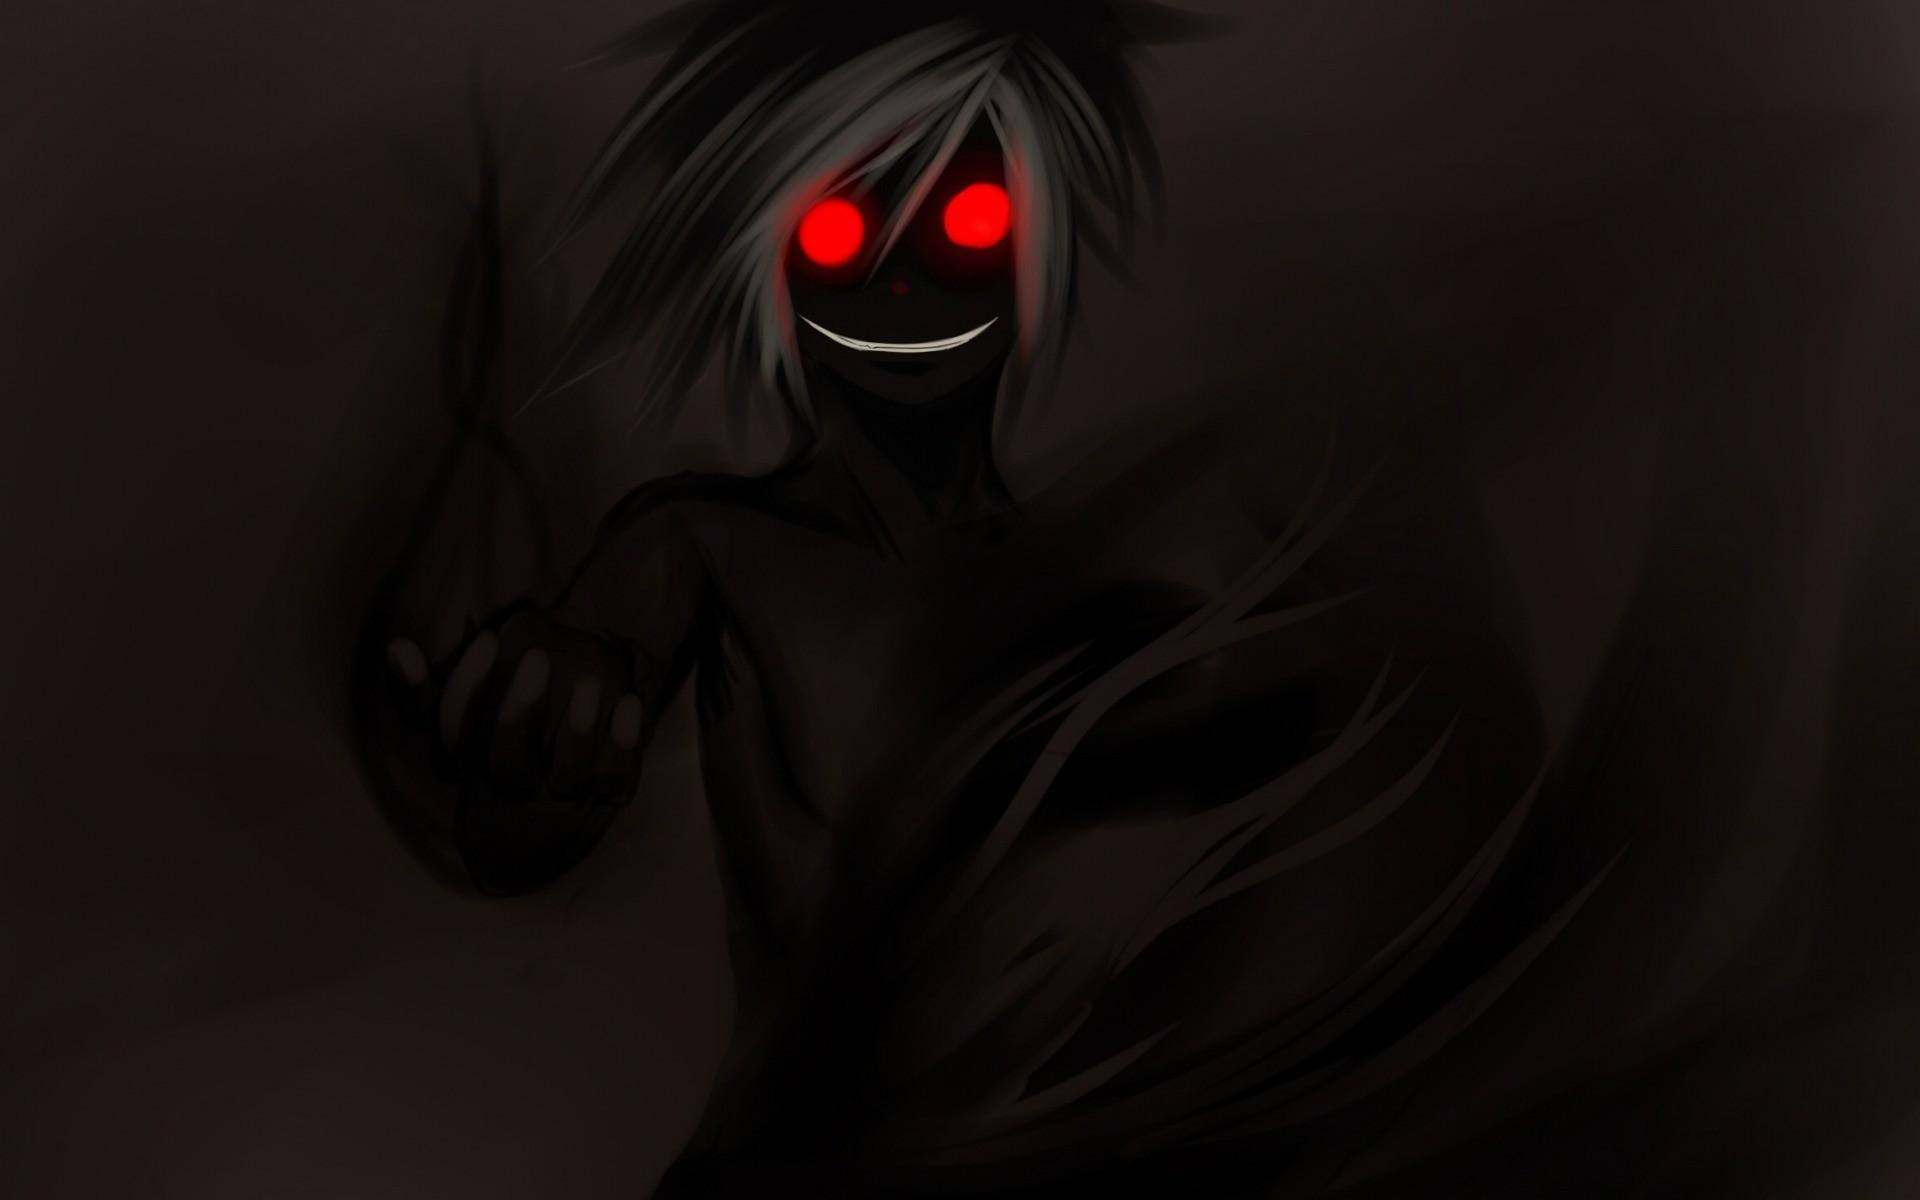 Black Monochrome Anime Manga Demon Darkness Screenshot Computer Wallpaper Human Body Fictional Character Organ